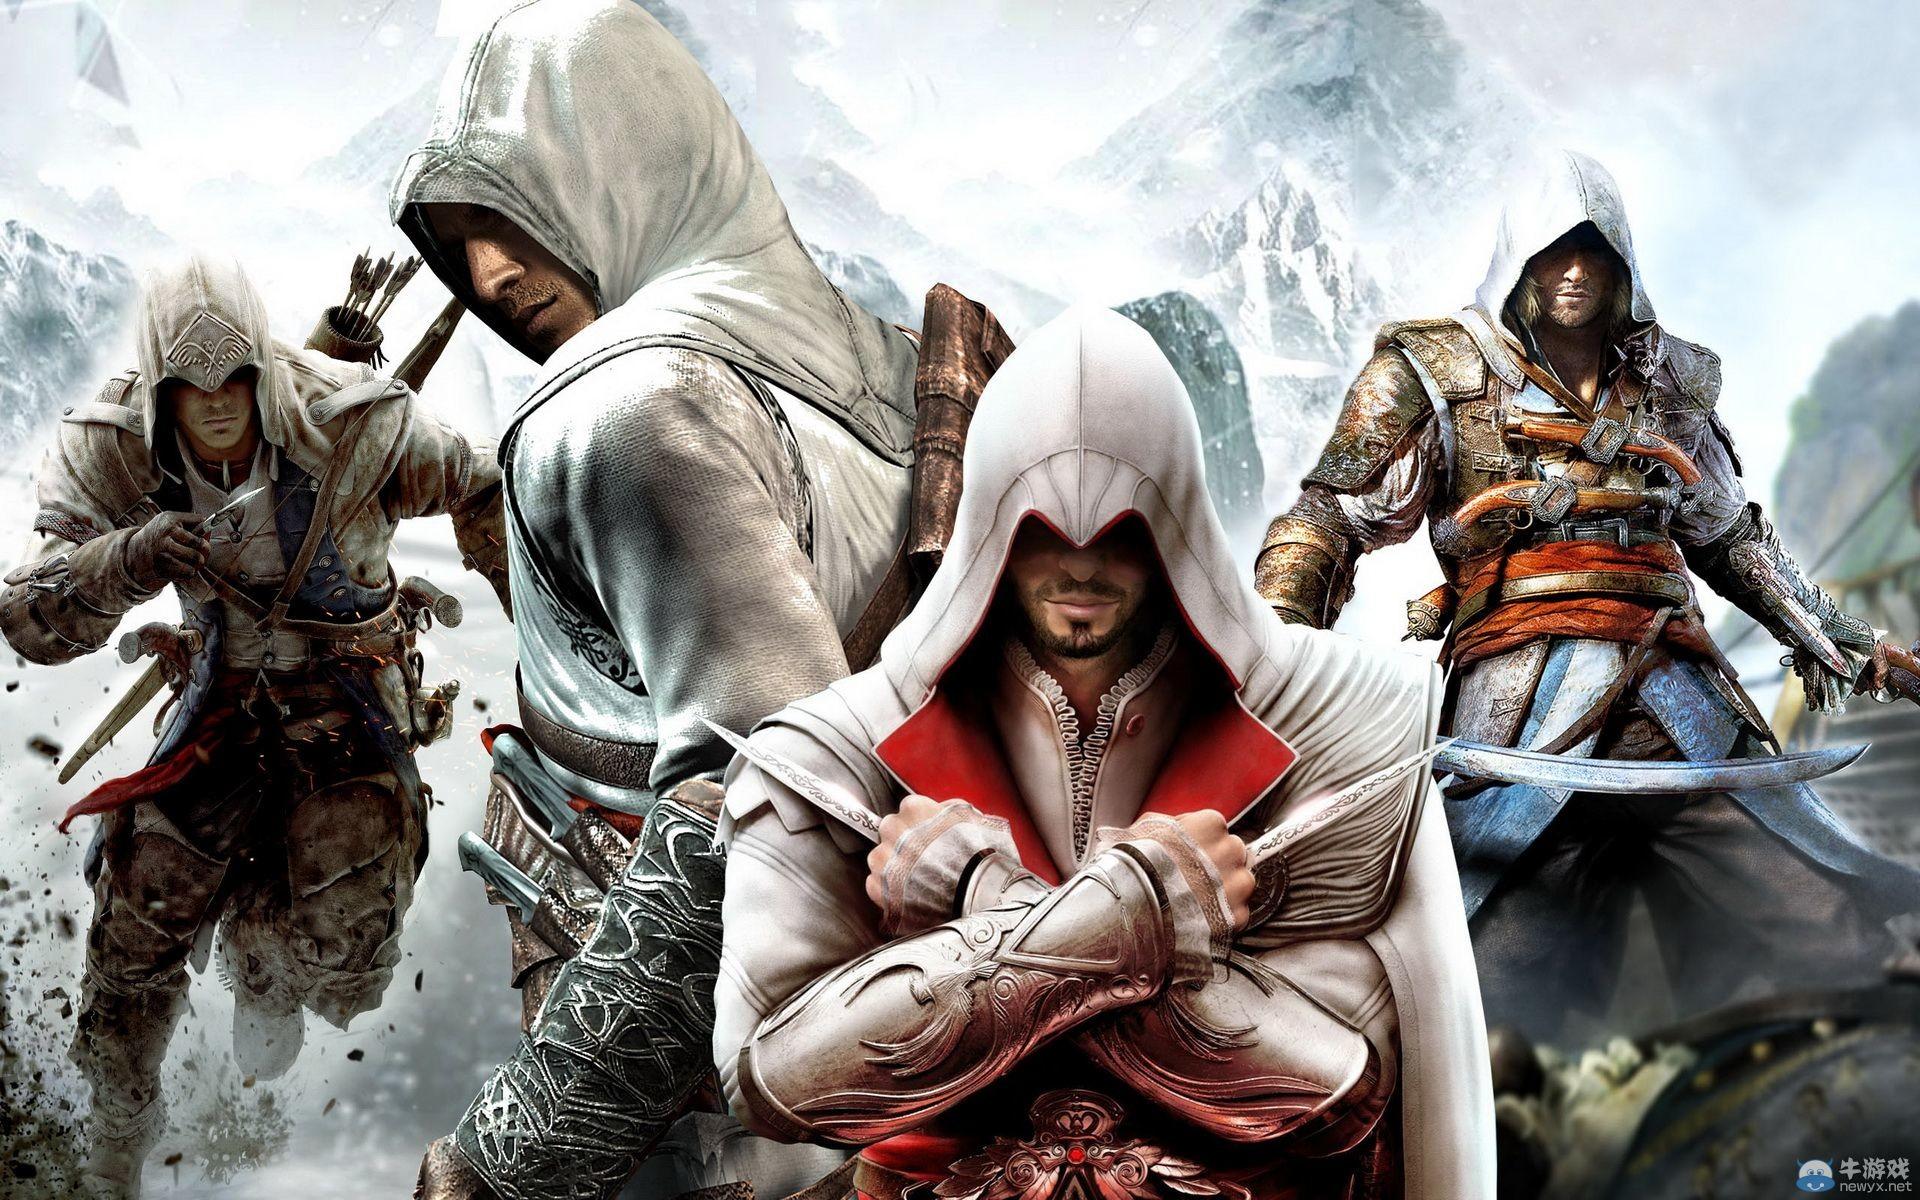 Assassin's Creed Black Flag Wallpaper HD | Assassins creed wallpaper | Assassins  creed Story | #4